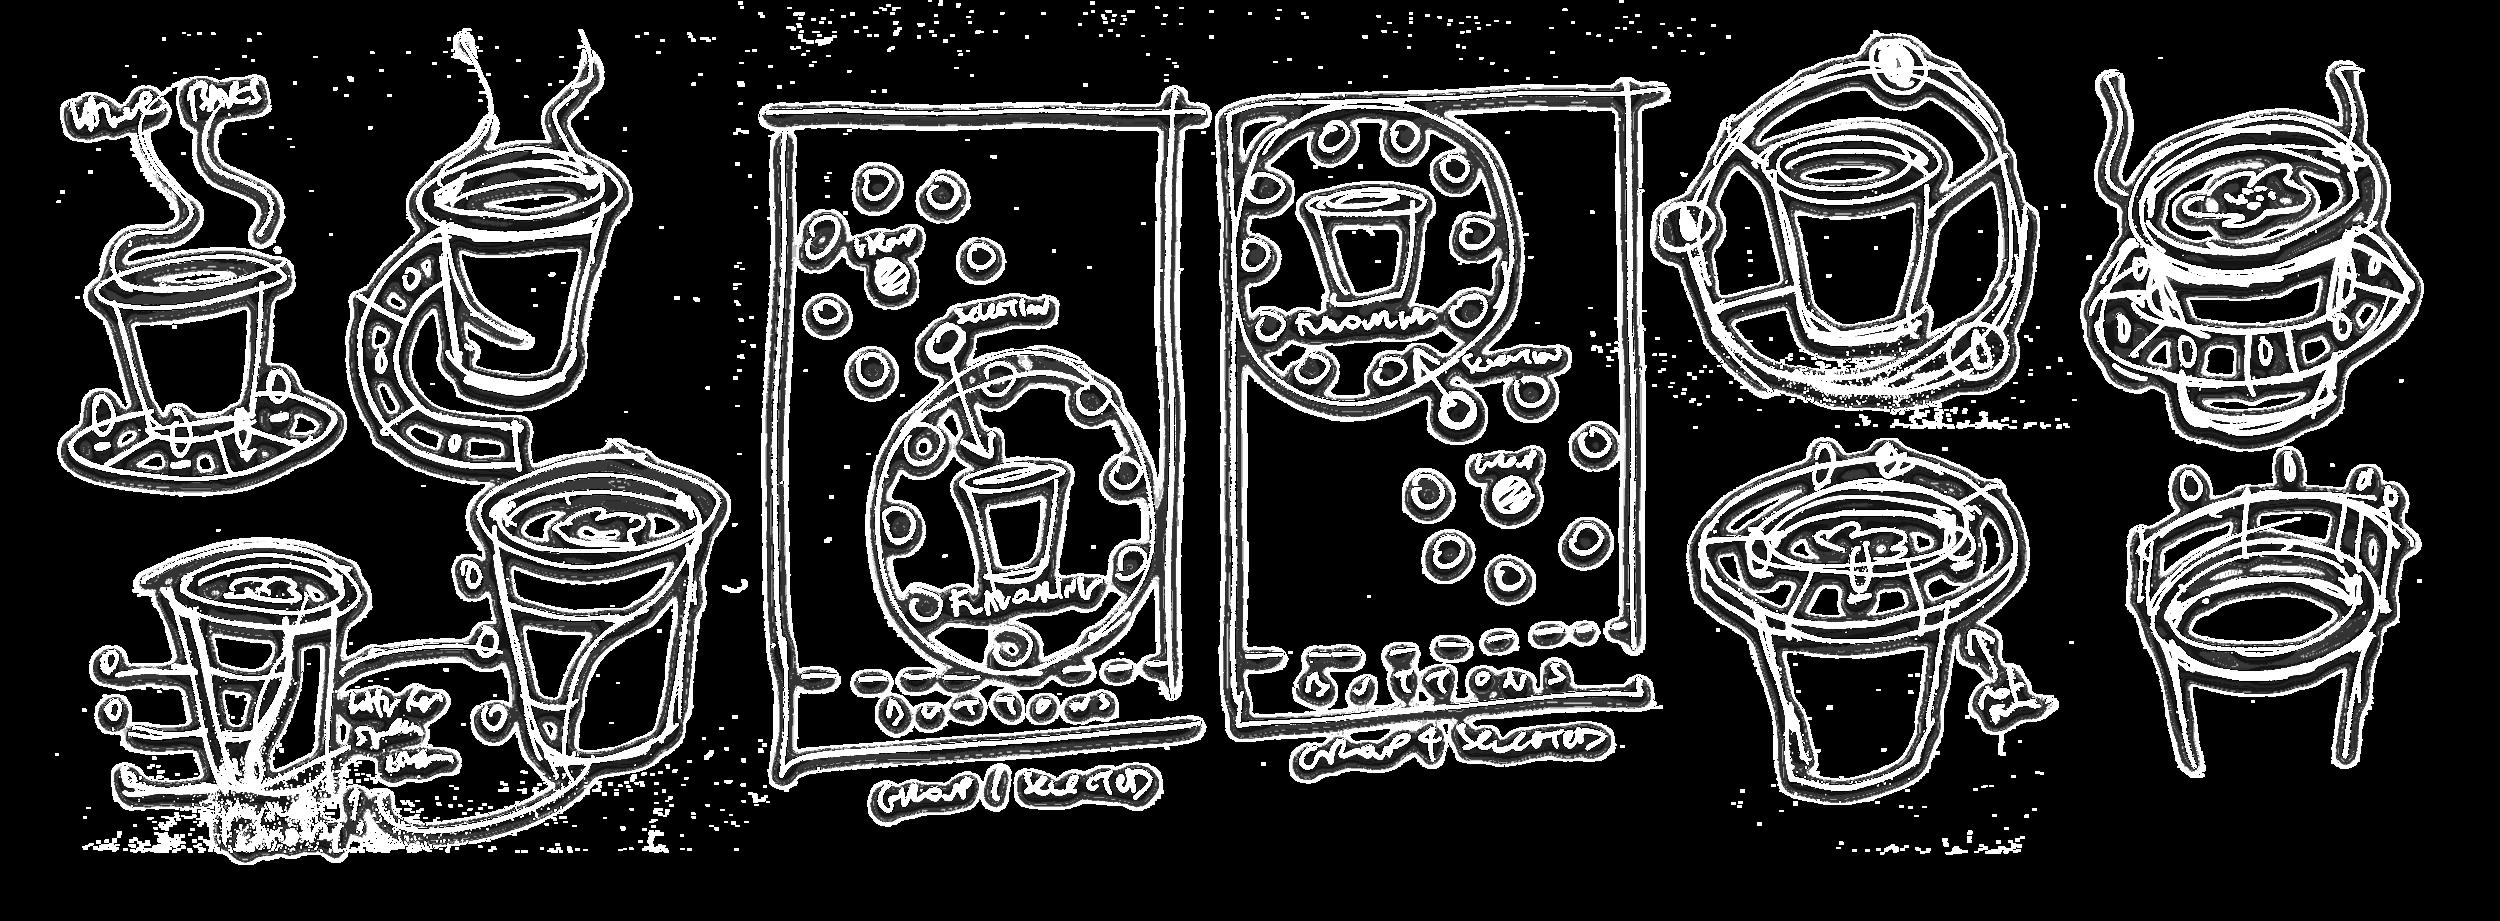 Atomhawk_Costa-Coffee_CEM200-Vending-Machine_UI-UX-Design_Concept-Sketches_Screen-Design-Sketches.png